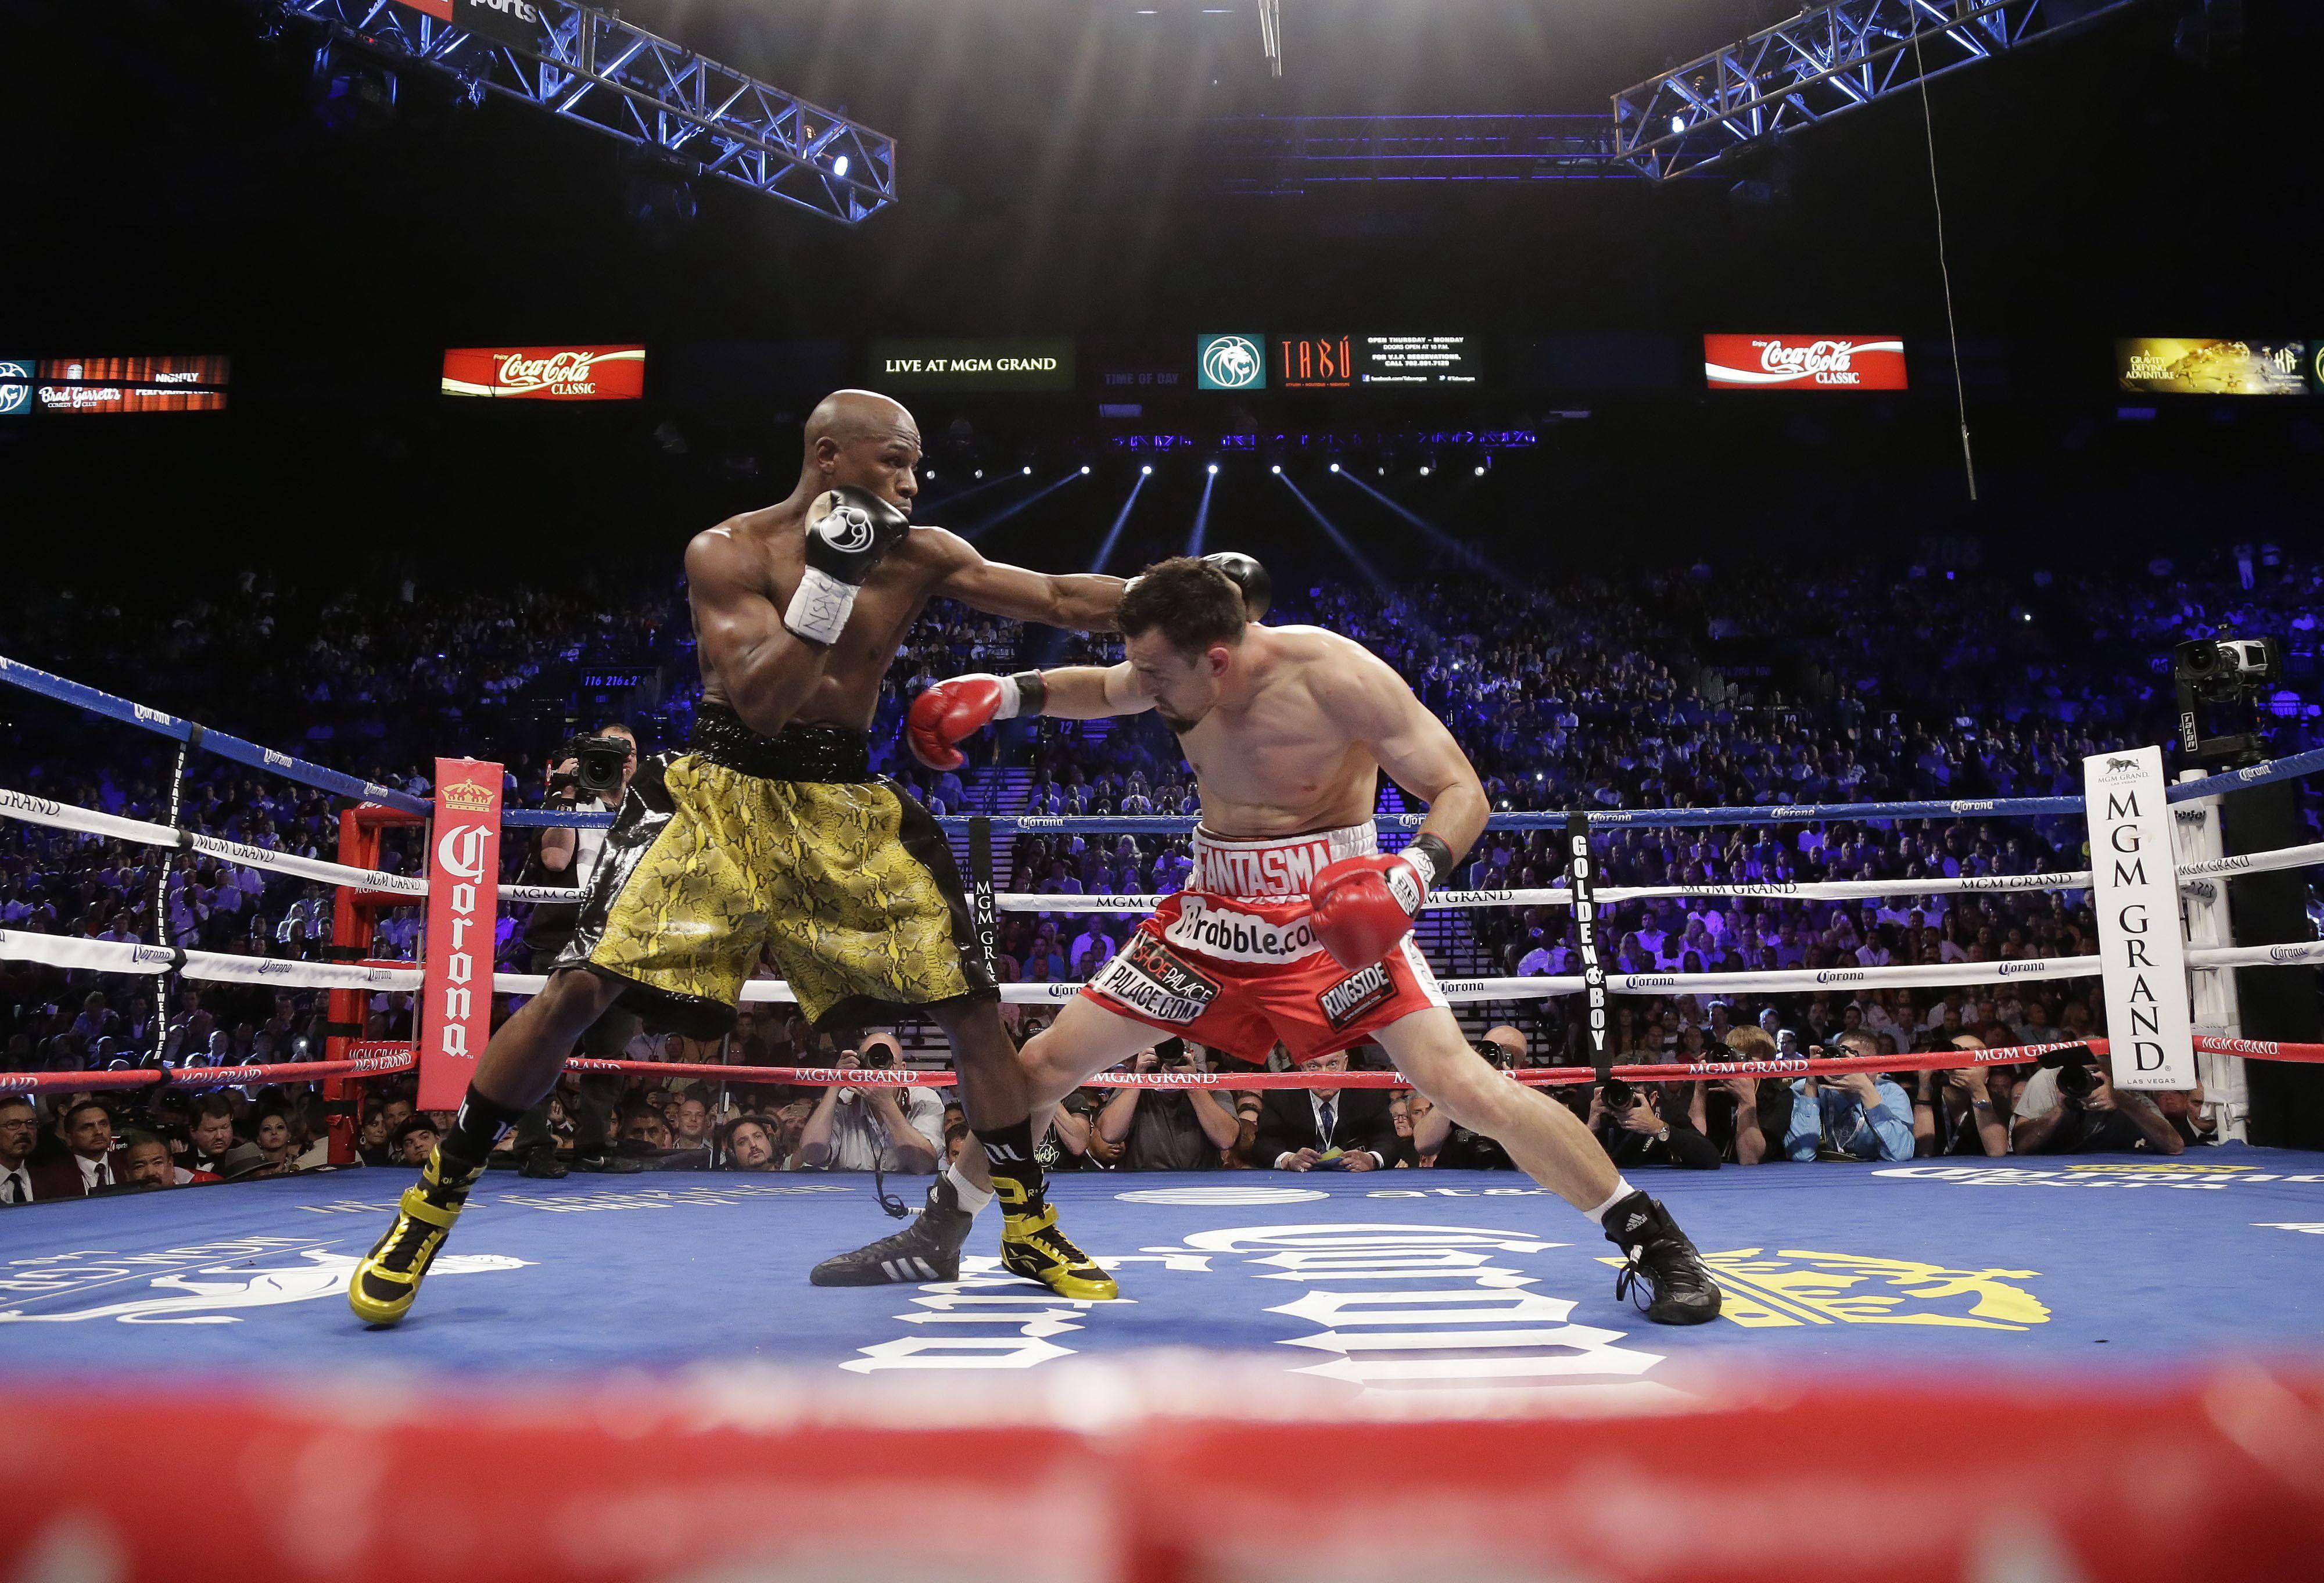 Boxing Wallpapers HD - Wallpaper Cave